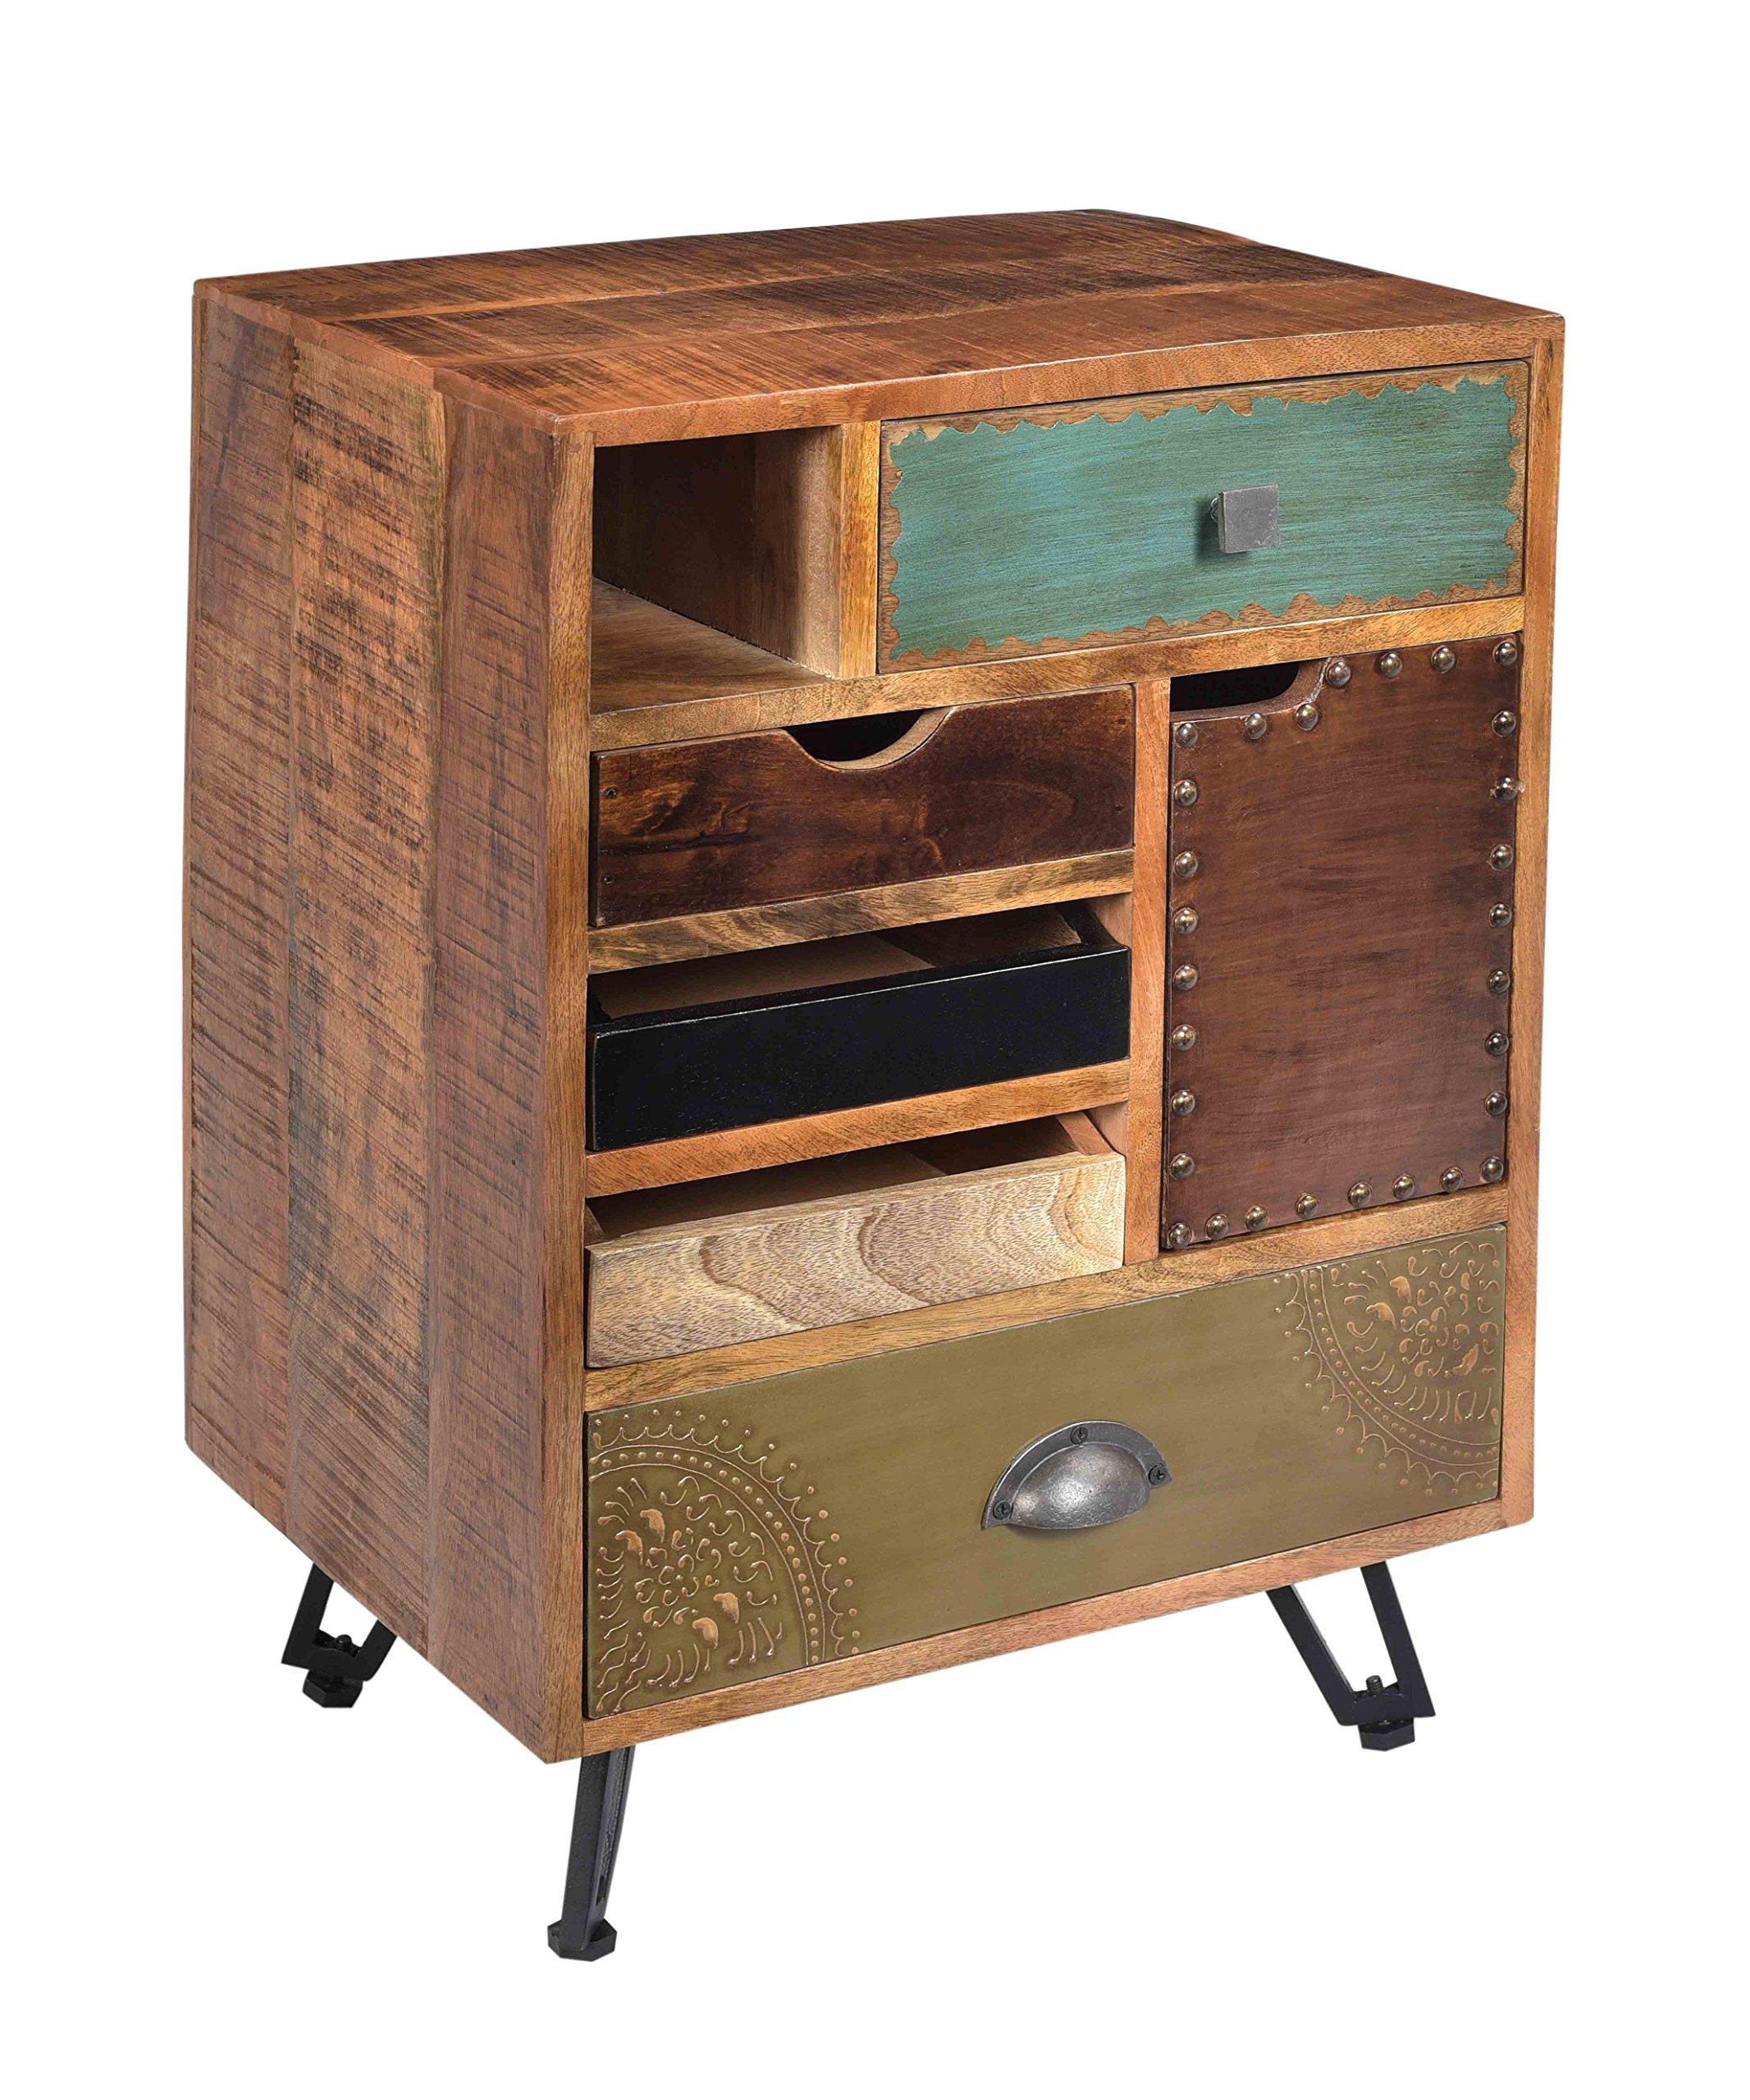 Treasure Trove Accents 17660 Brisbane Five Drawer One Door End Table, Multicolored